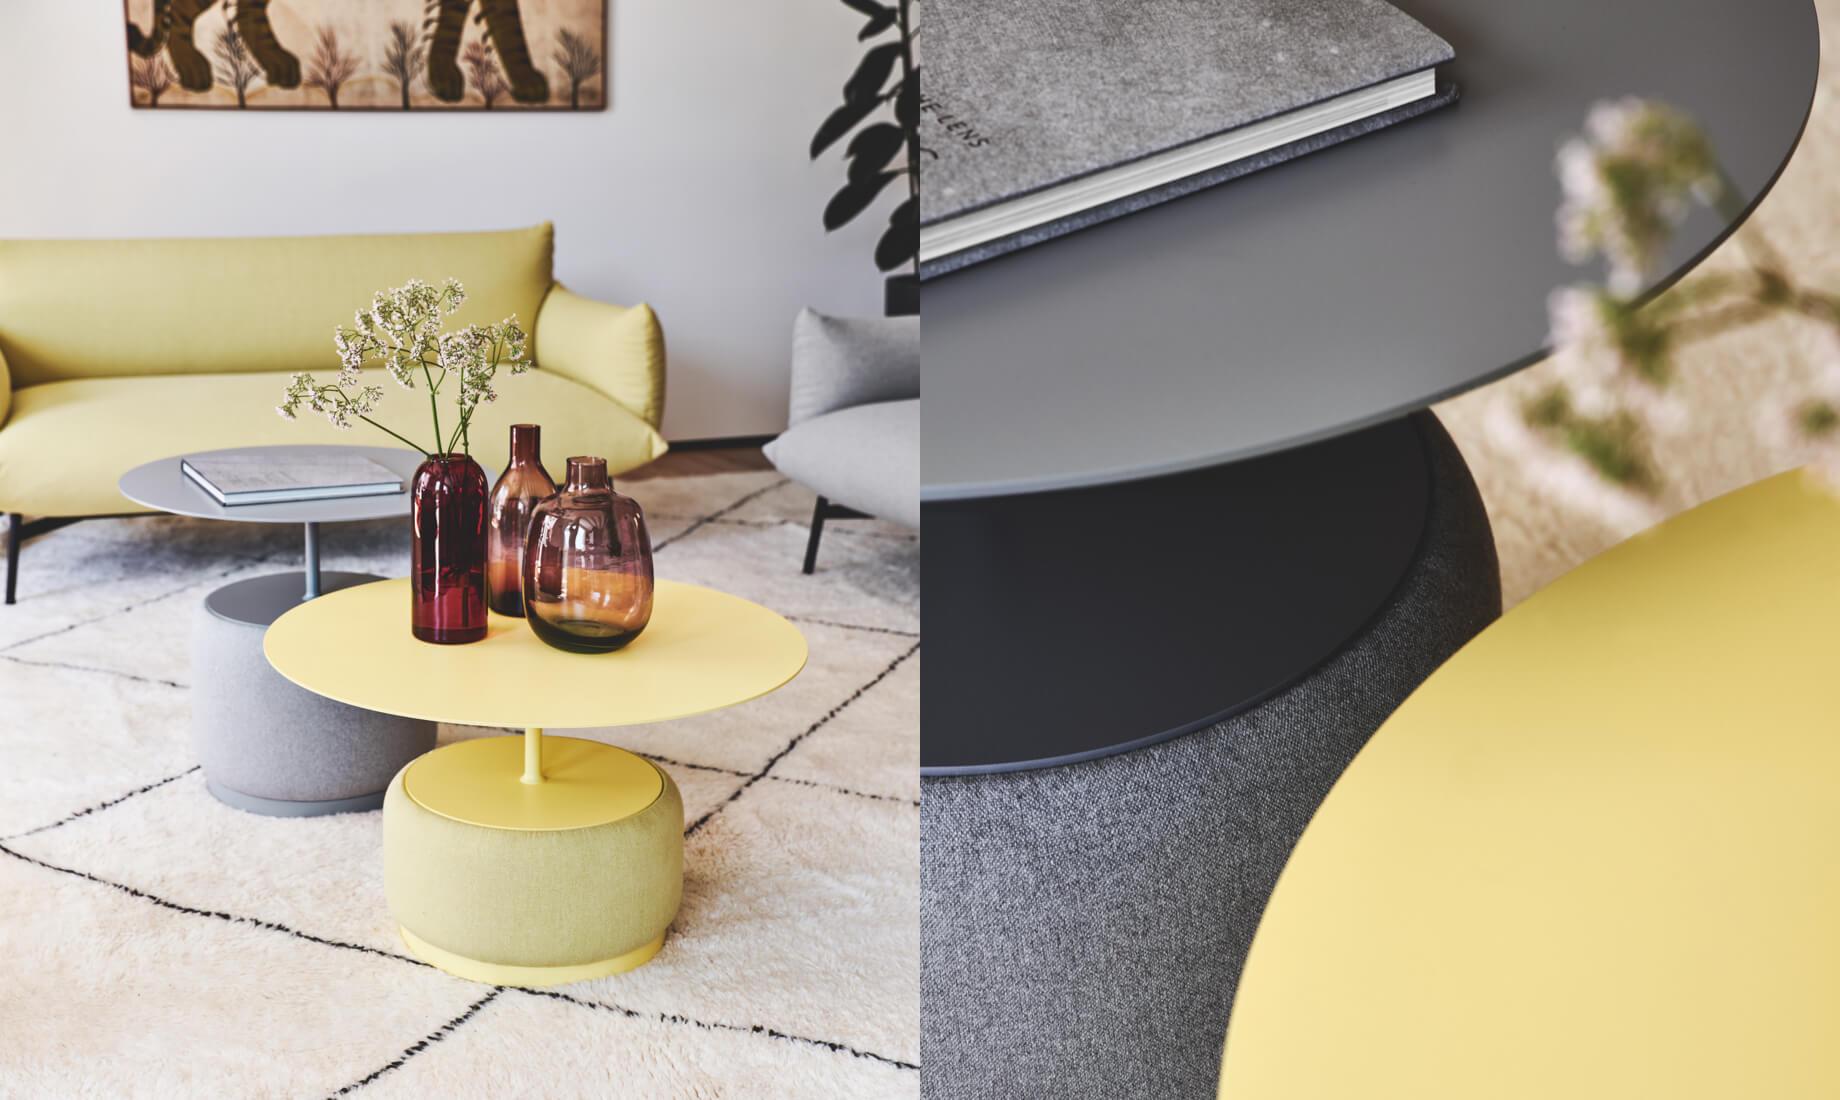 Midj - Coffee table Bloom